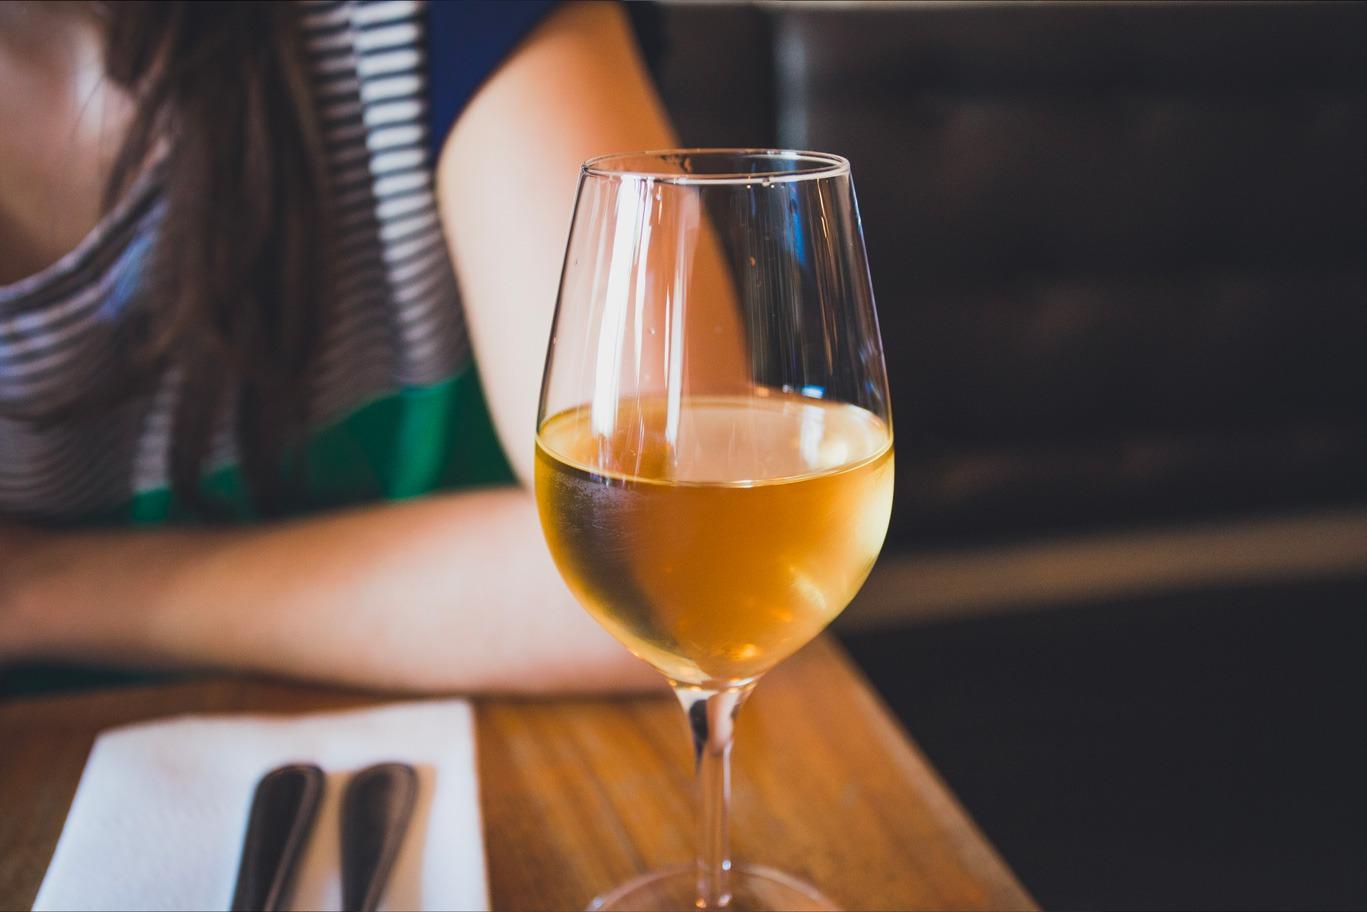 estiva malvasia Audarya vino bianco